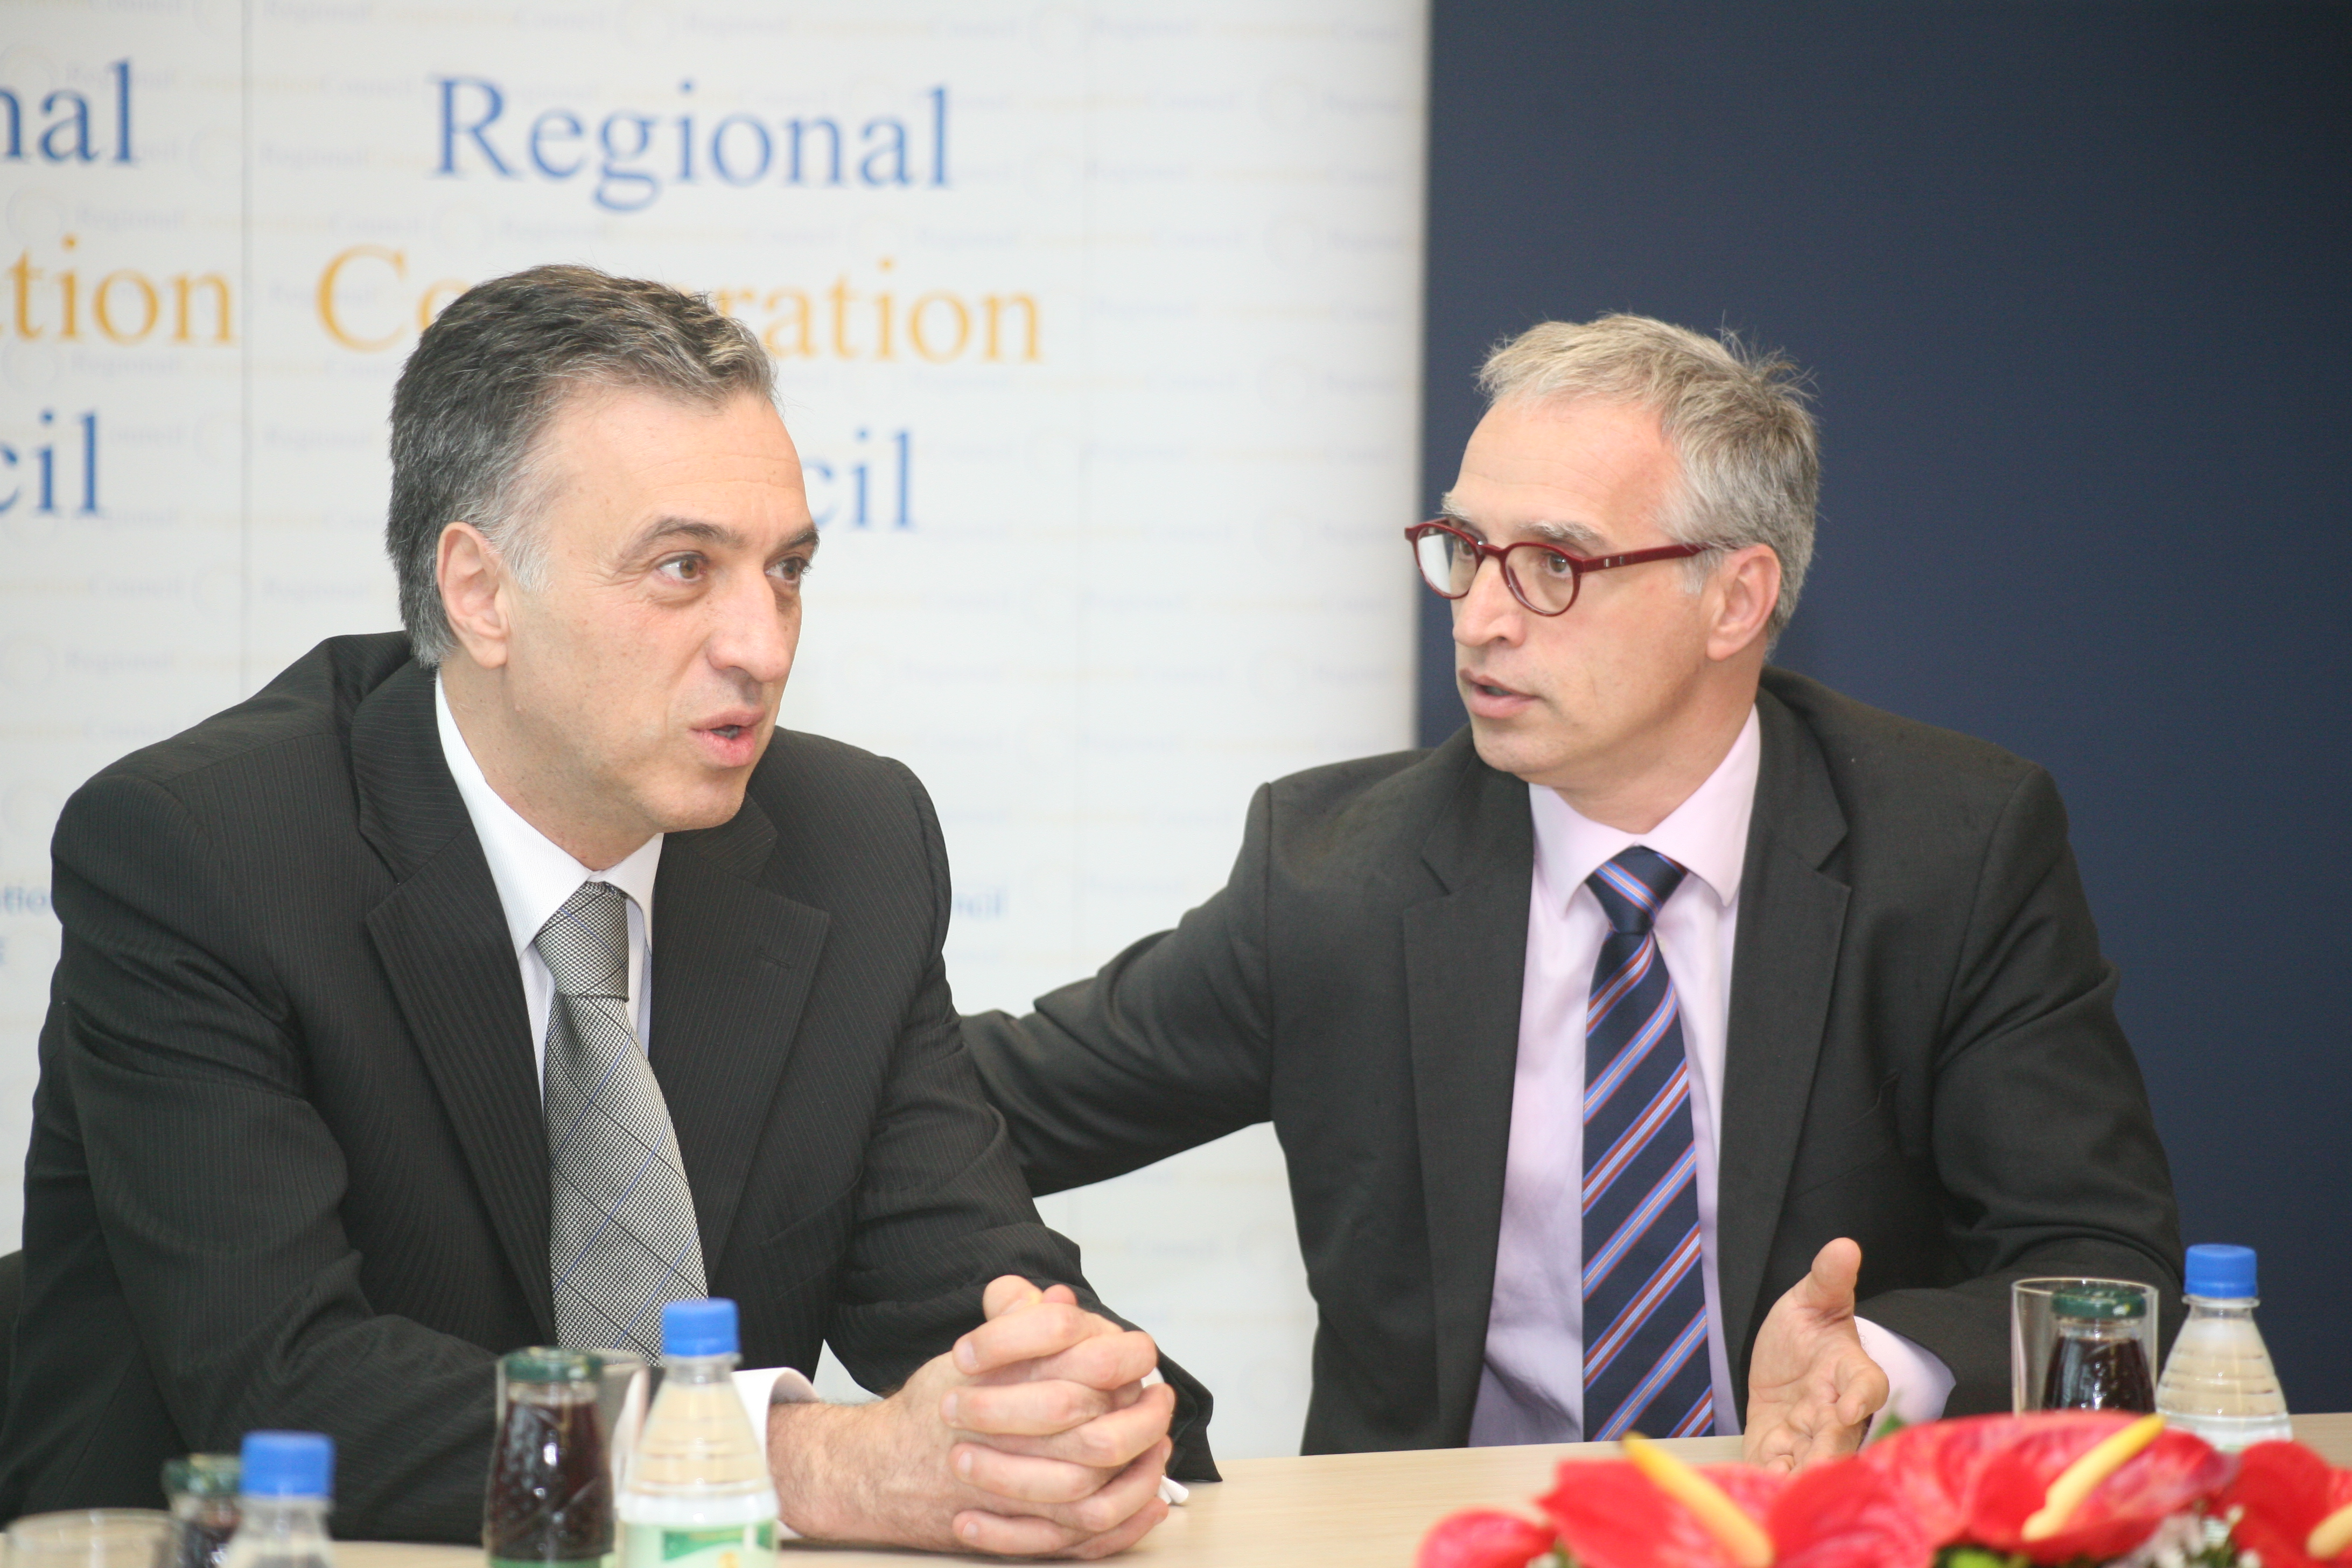 Goran Svilanović (left), RCC Secretary General, met with Filip Vujanović, President of Montenegro, at the organisation's Secretariat in Sarajevo on 14 May 2014. (Photo RCC/Zoran Kanlic)